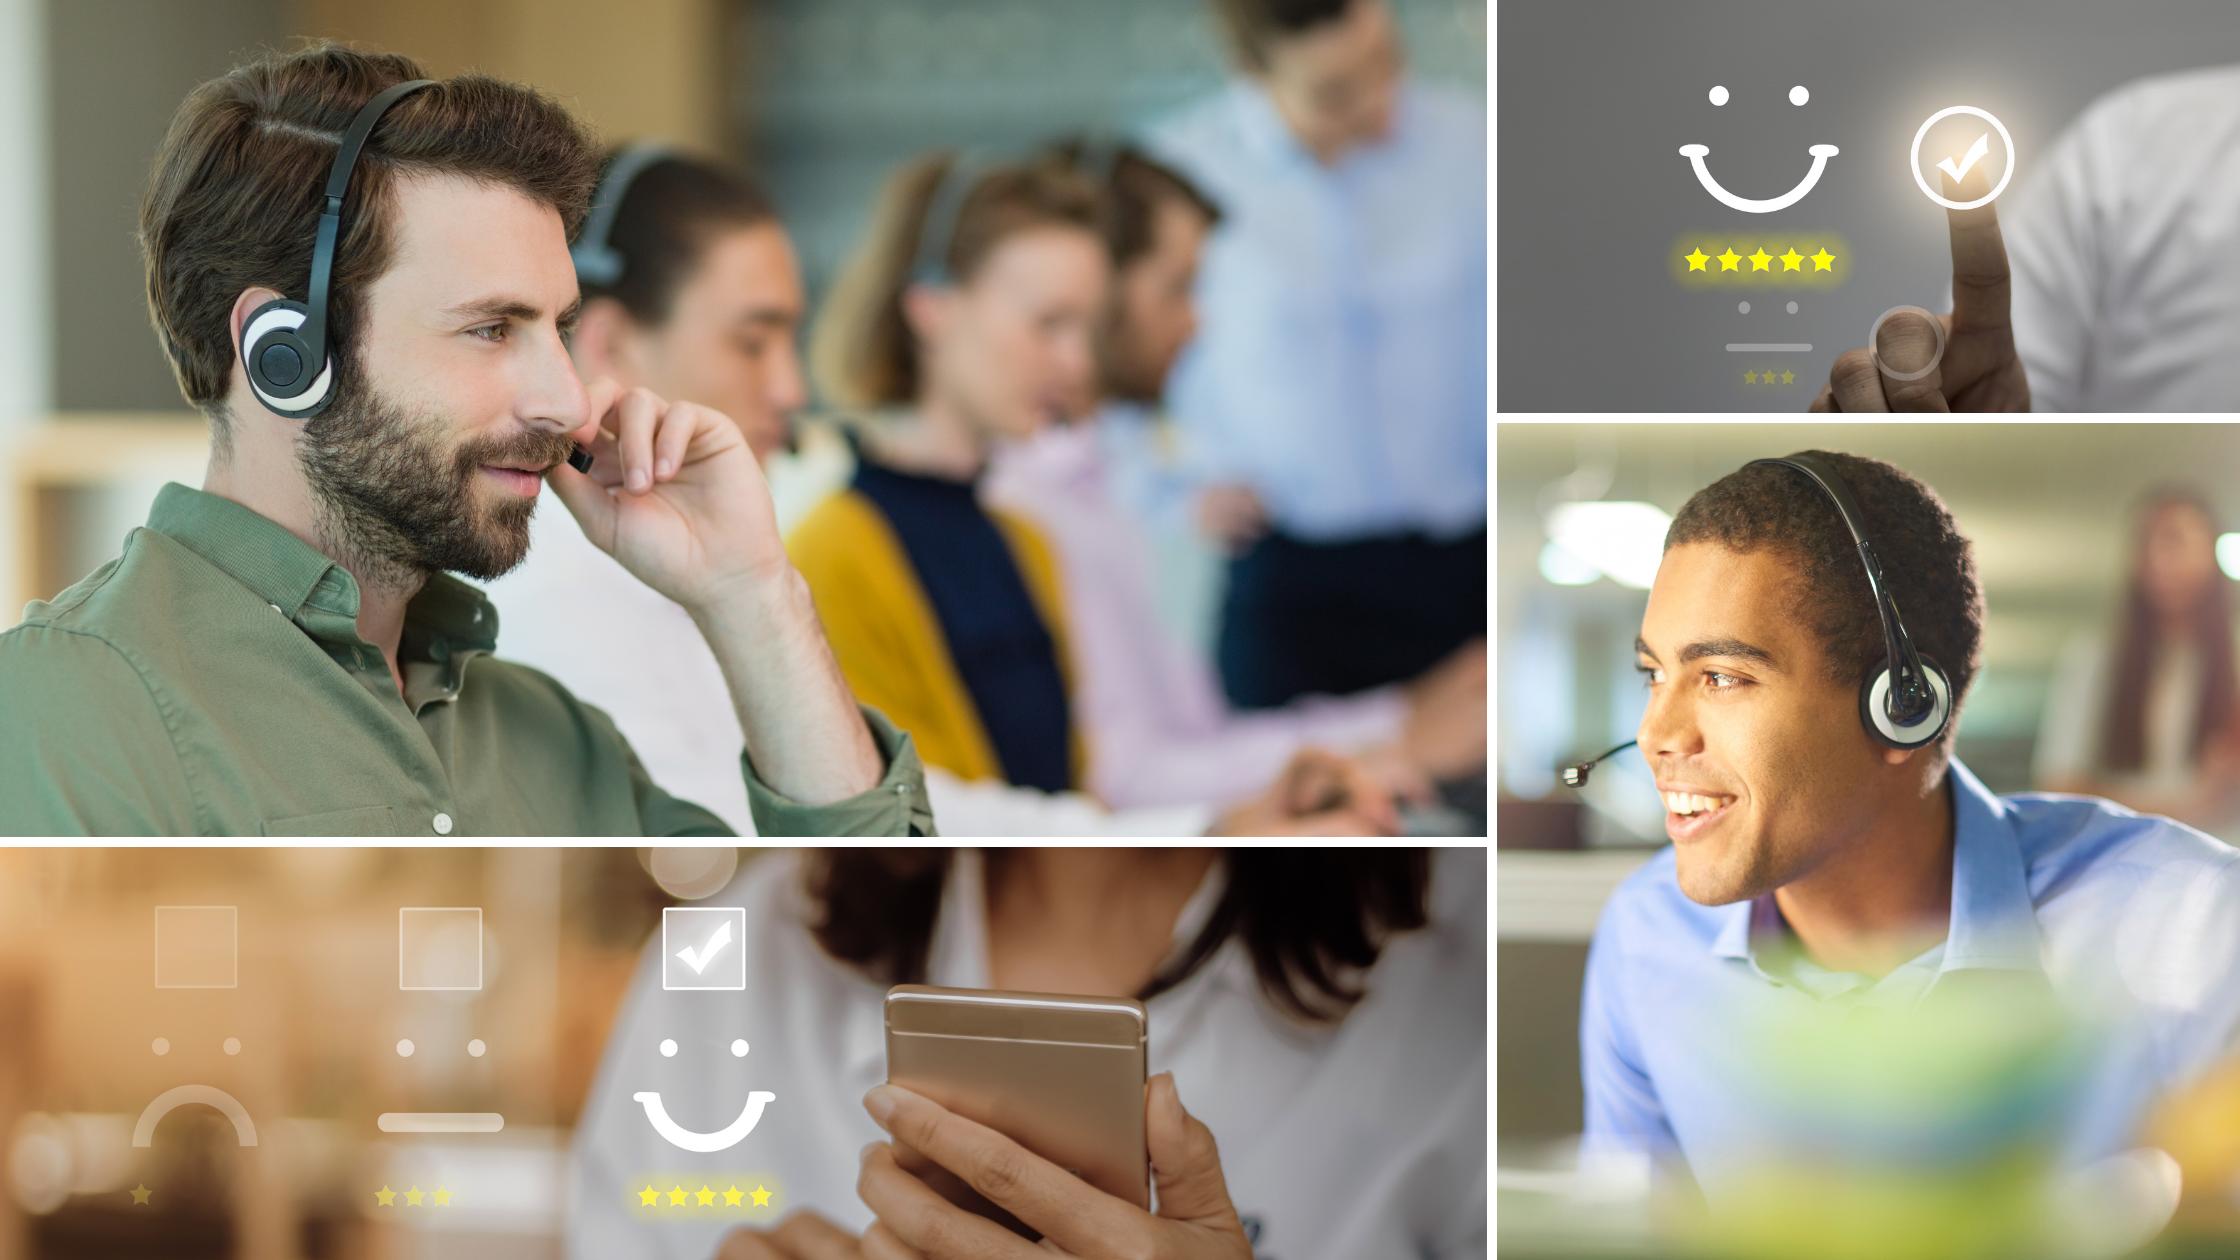 CX vs CS – Customer Experience vs. Customer Service